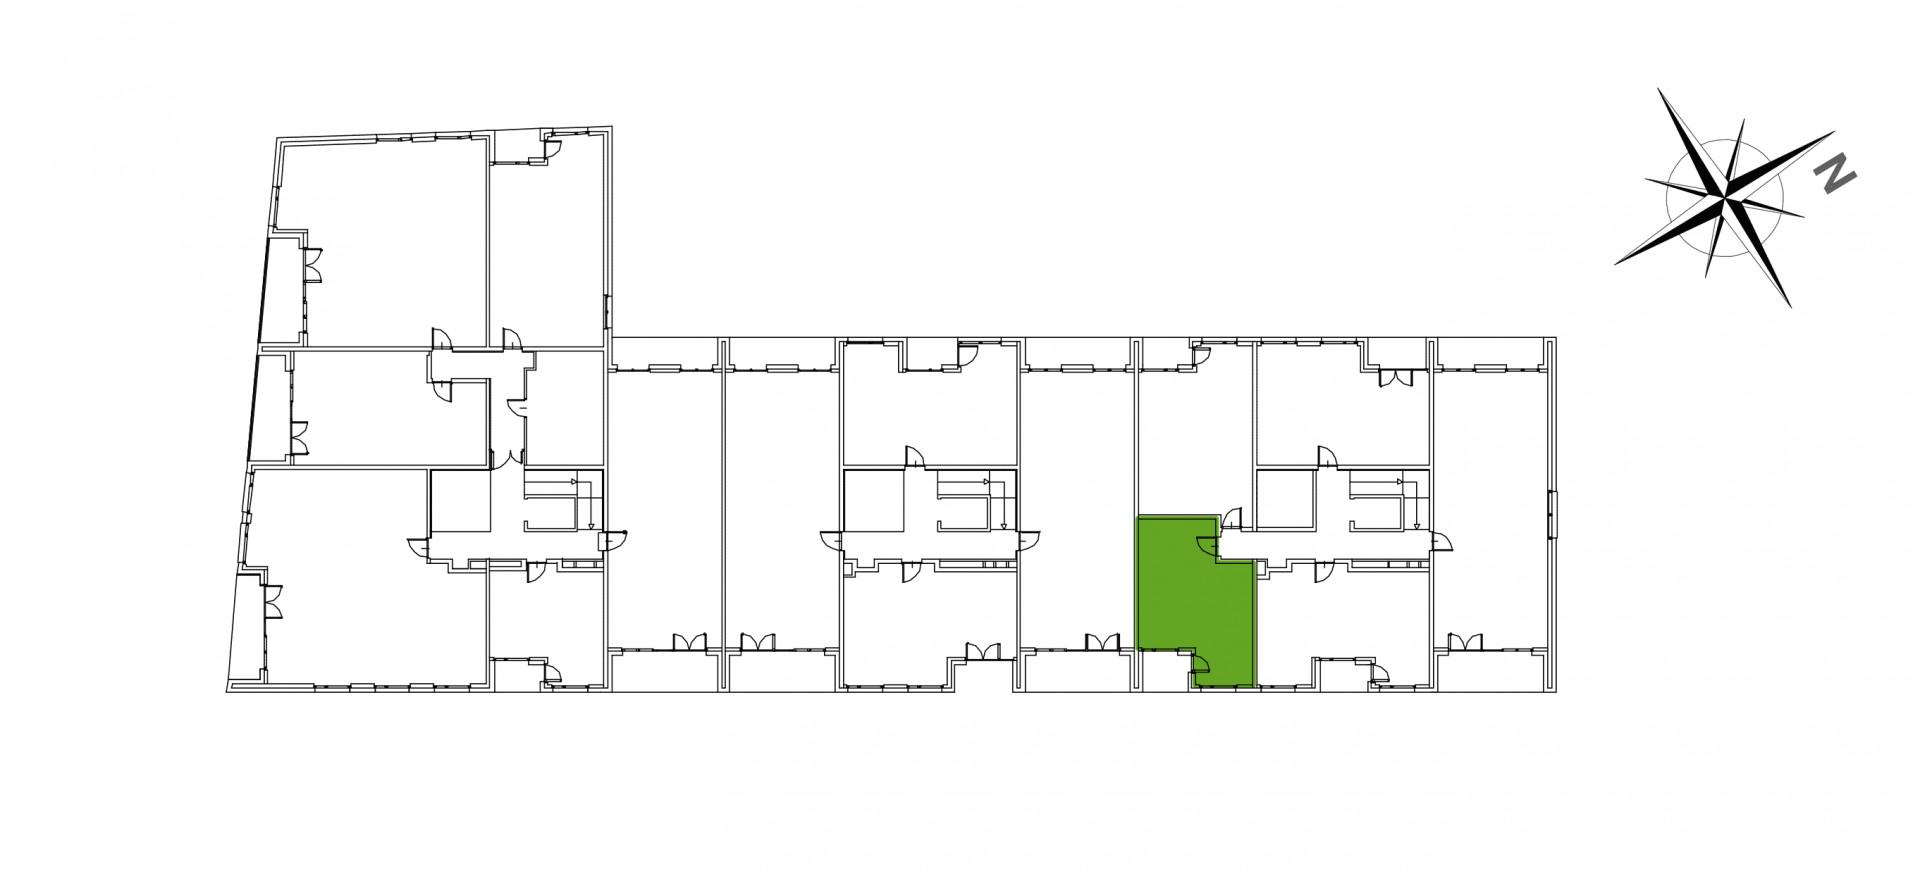 Mazowiecka 72 / apartament nr 6 rzut 2